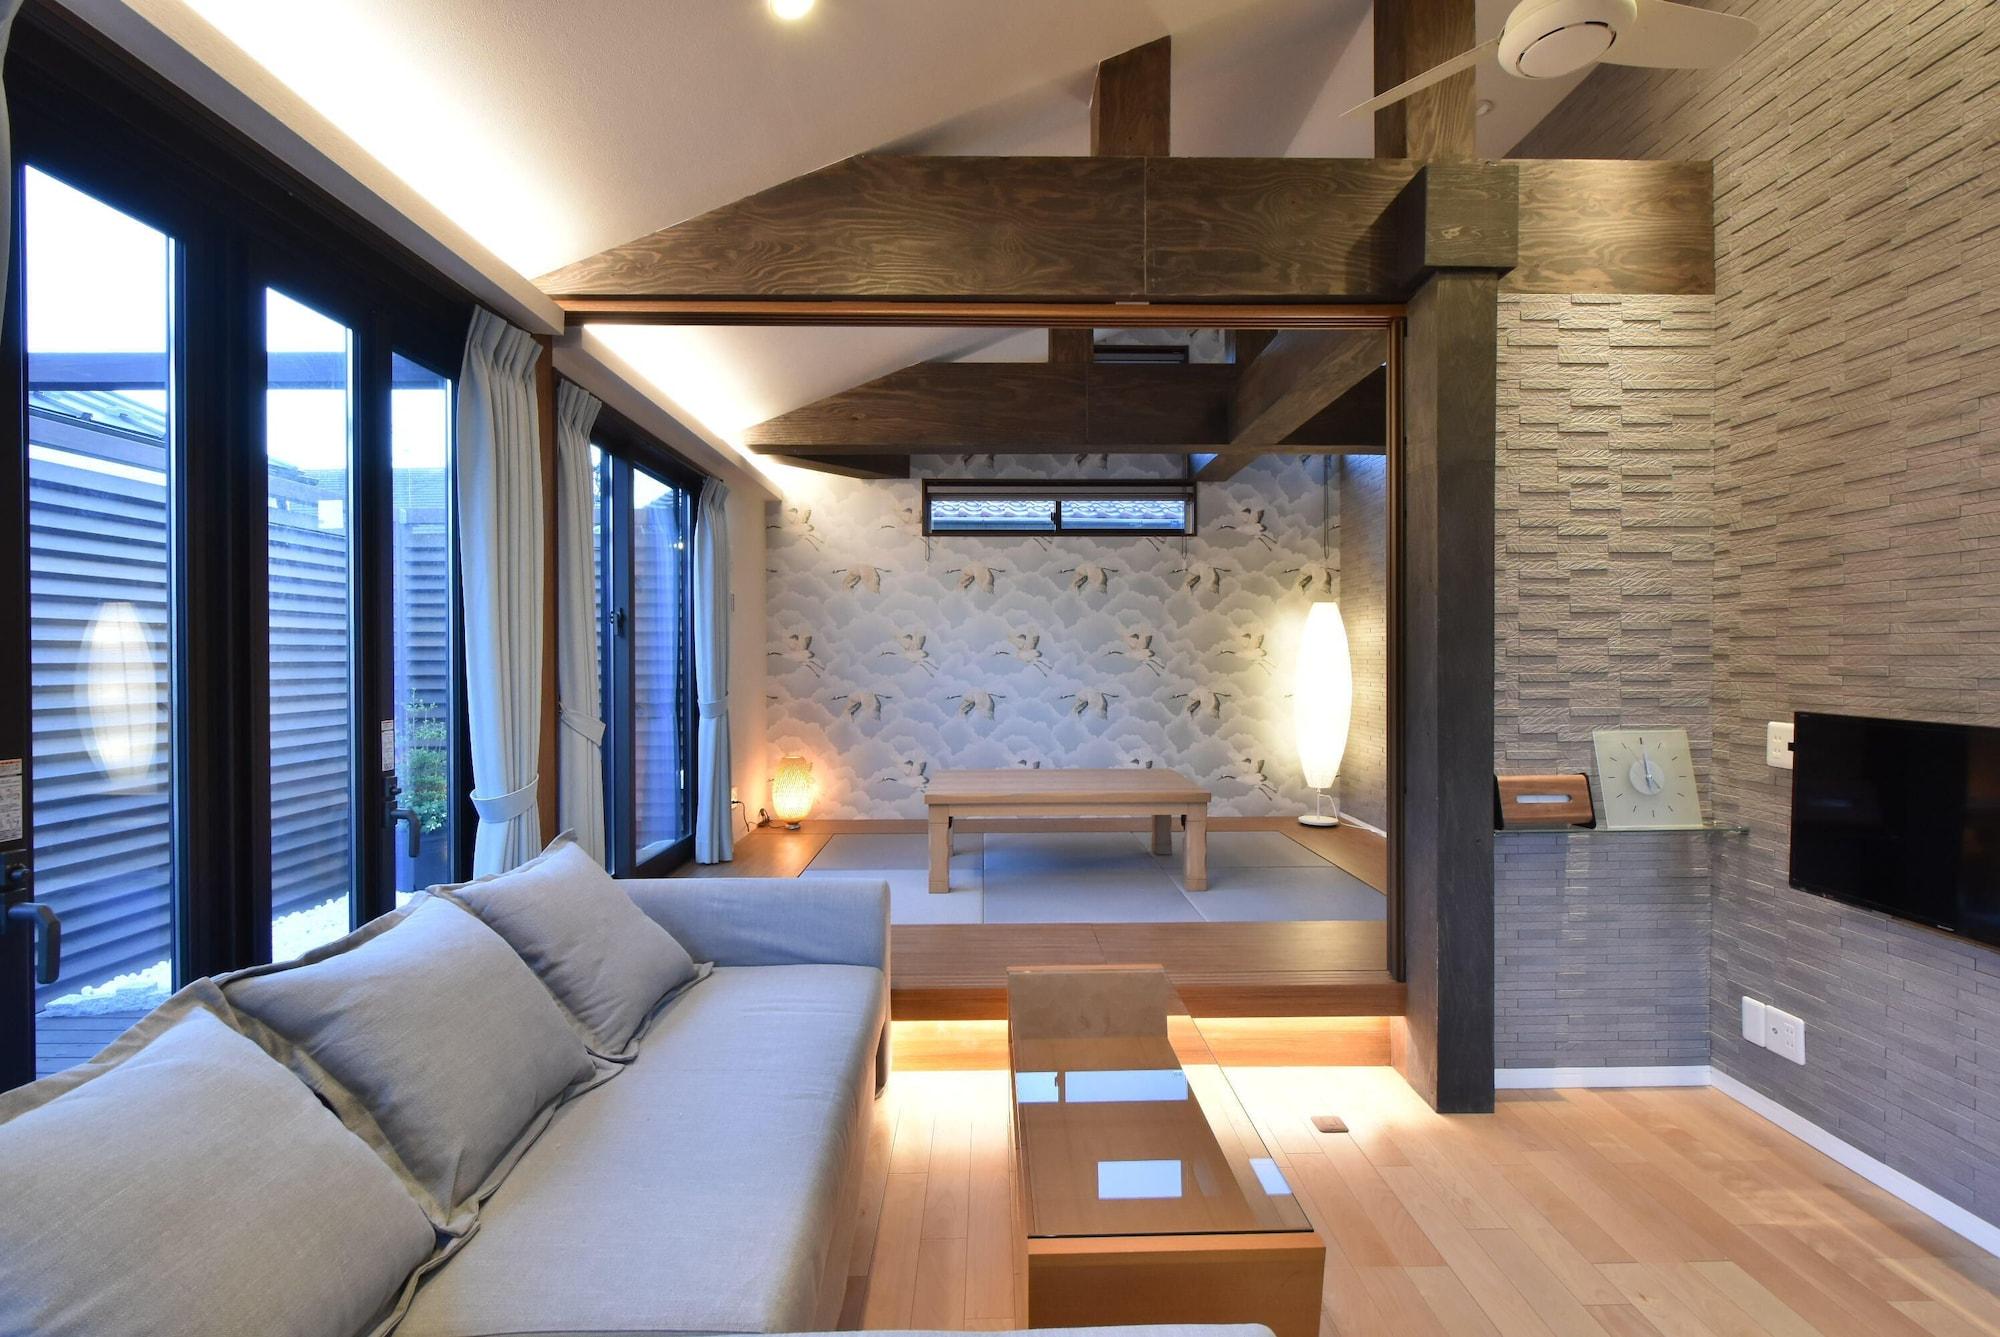 Asakusa East Terrace - KANDO -, Katsushika